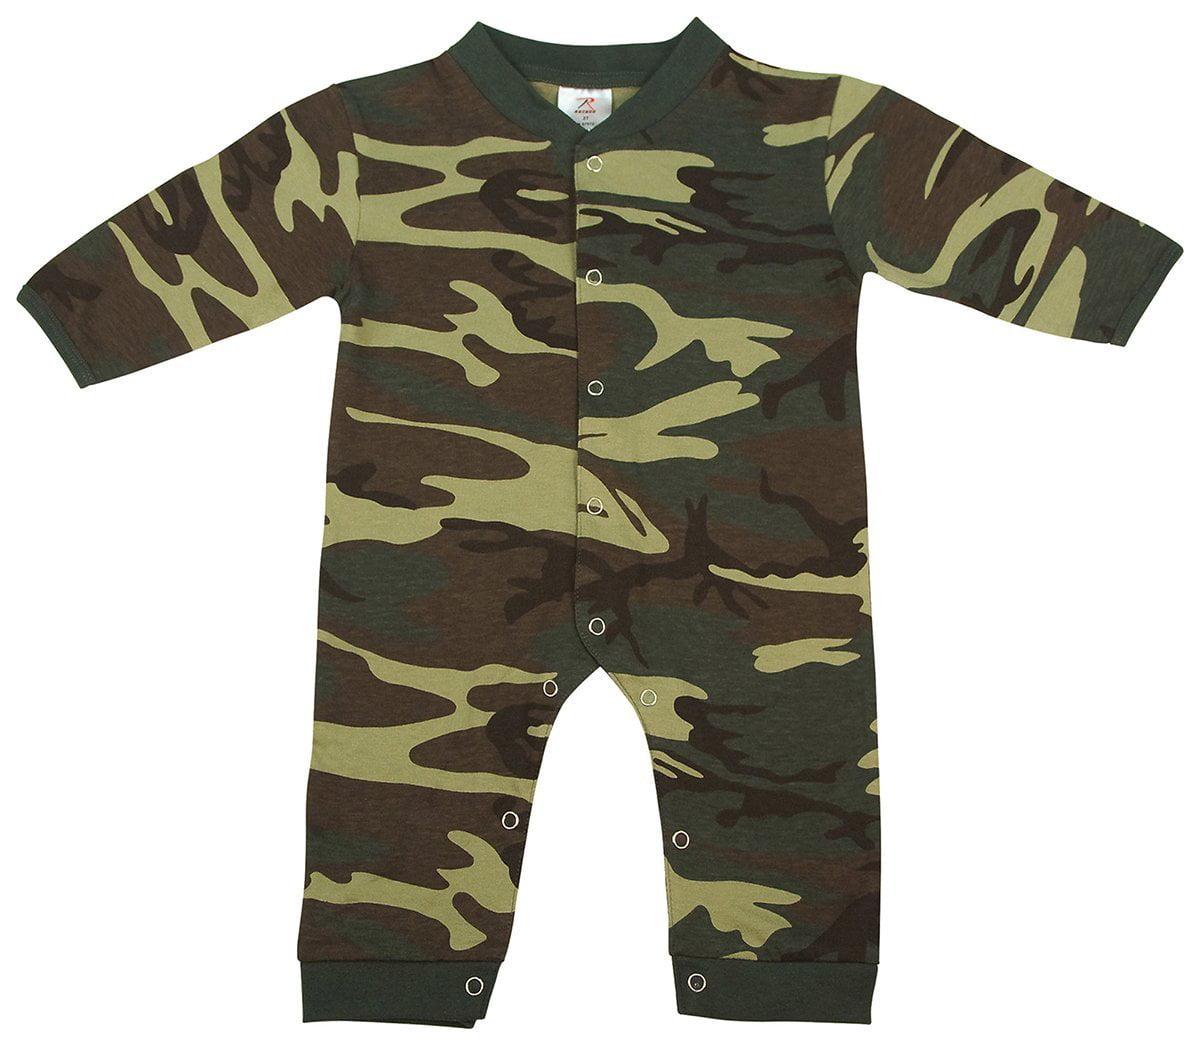 ACU Digital Camouflage Baby Newborn Infant One Piece Suit